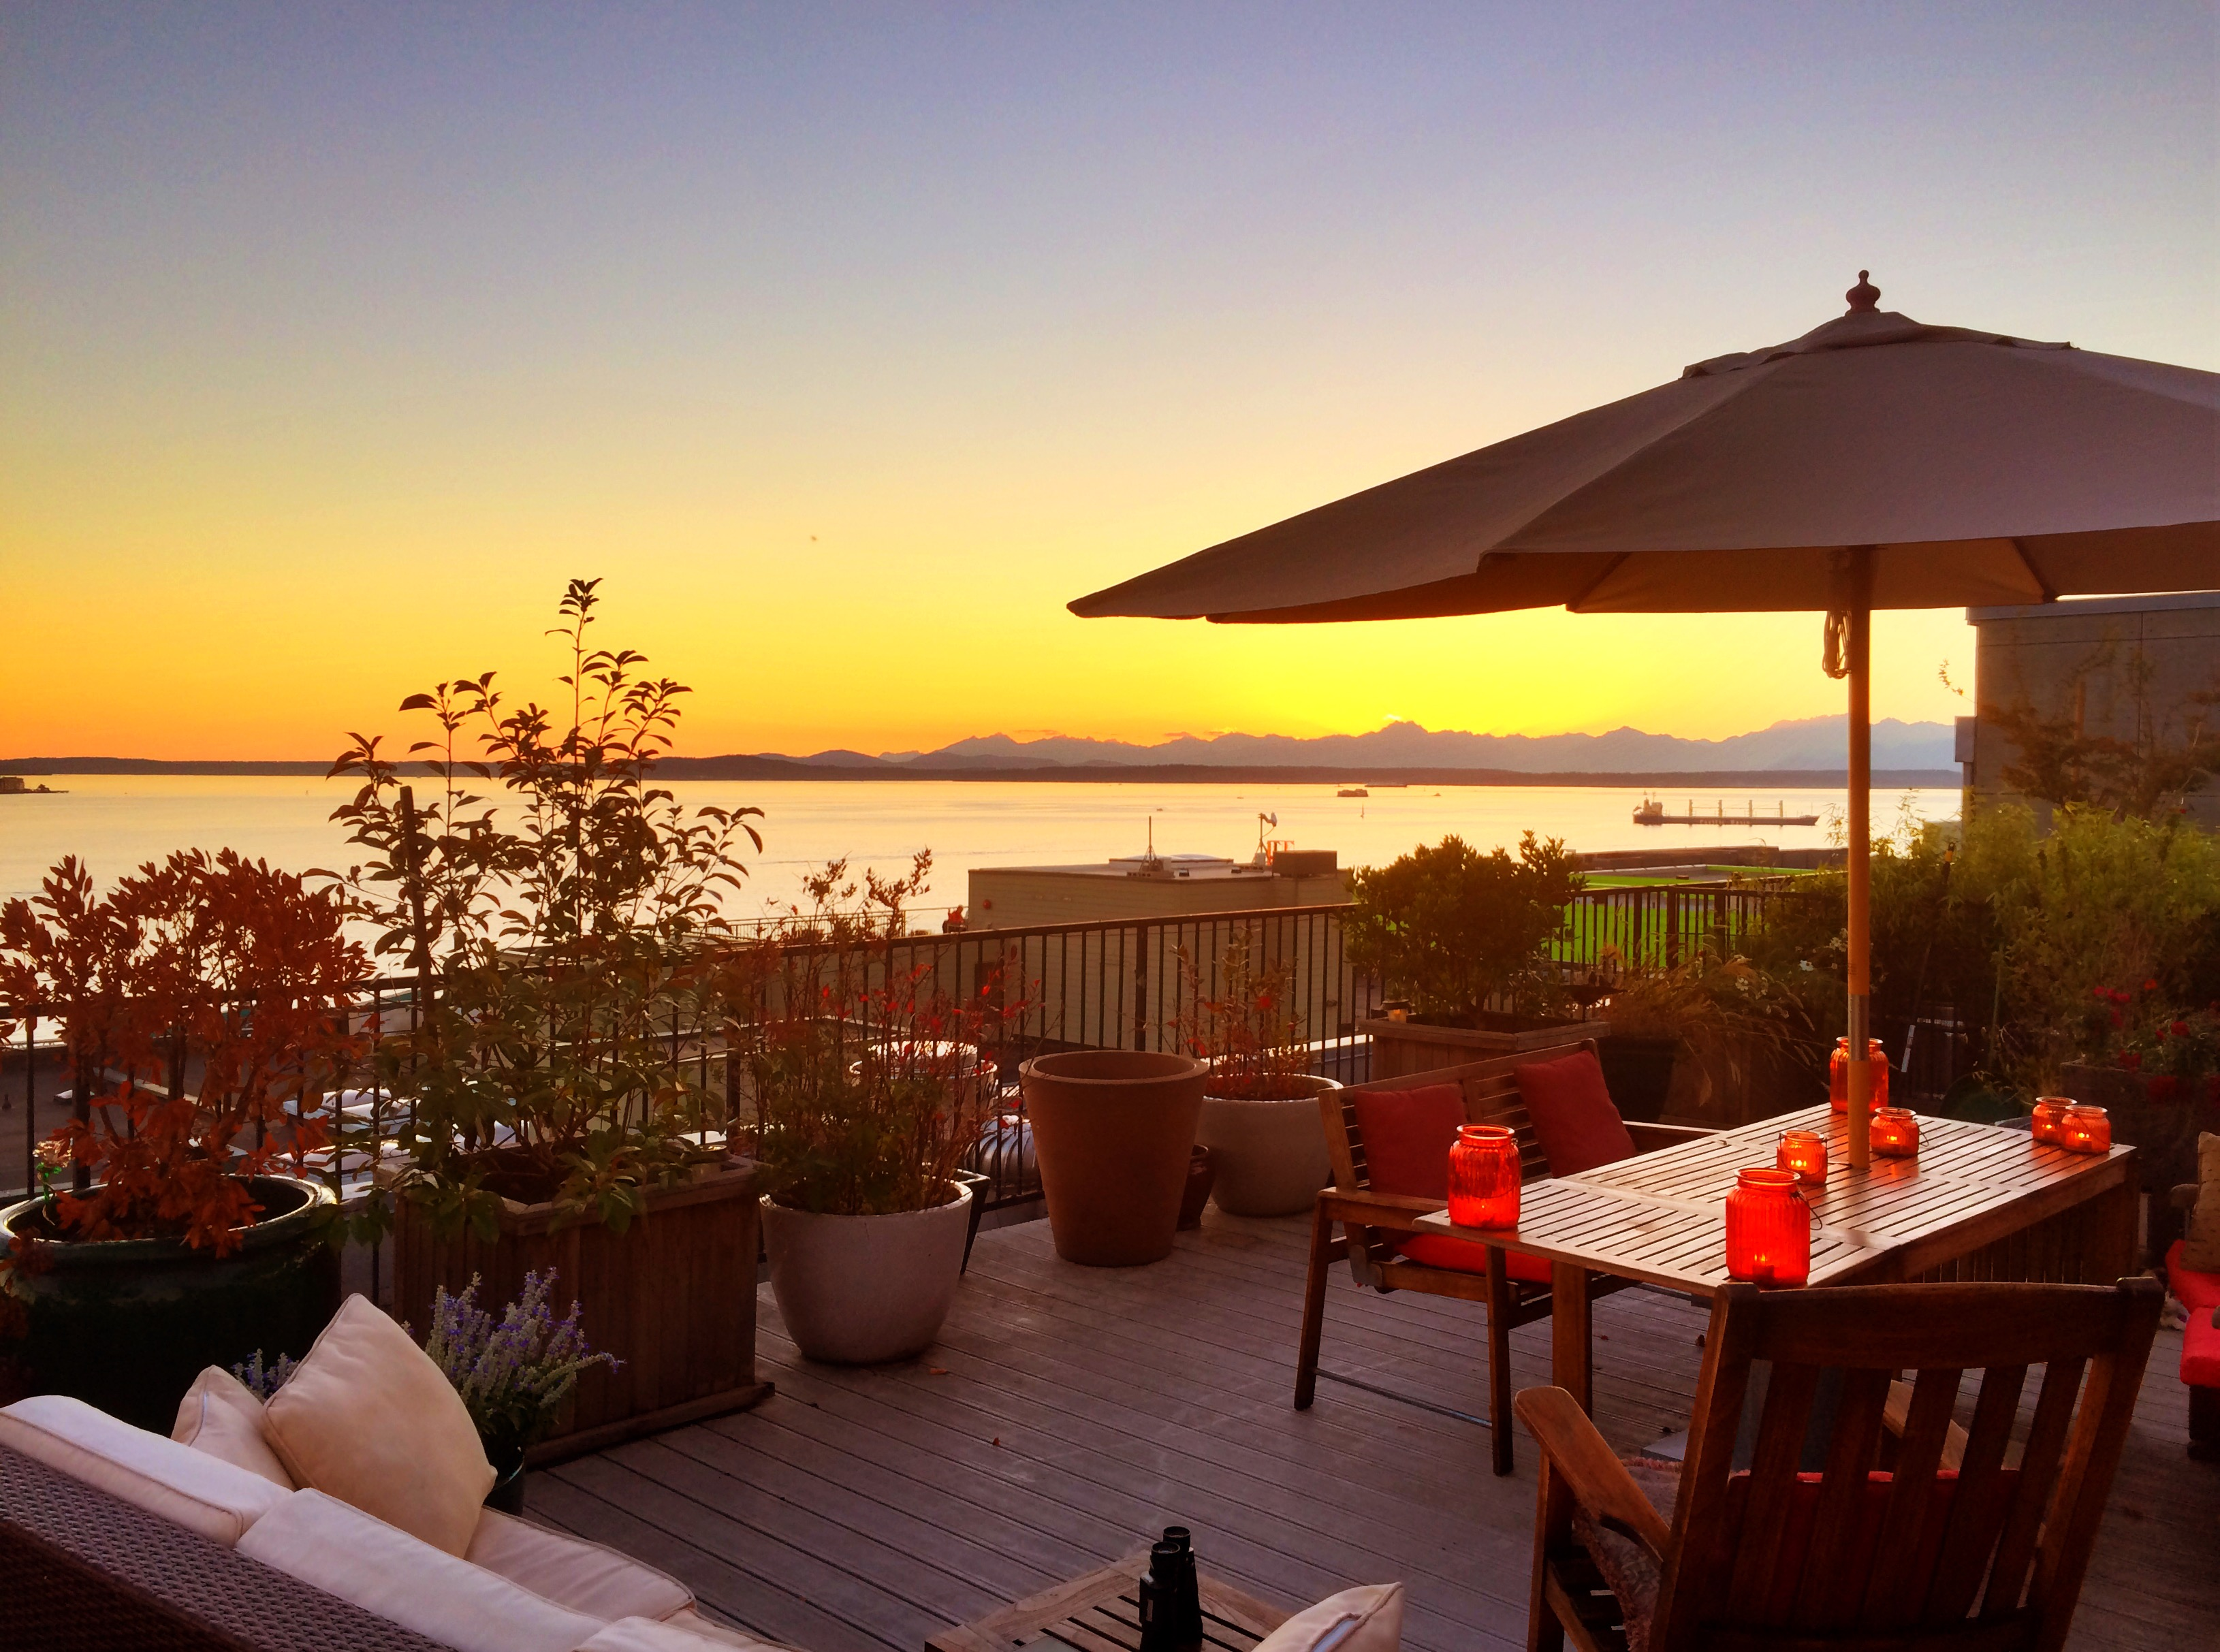 Condominium for Sale at Belltown Lofts #B-302 66 Bell Street #B302 Belltown, Seattle, Washington 98121 United States